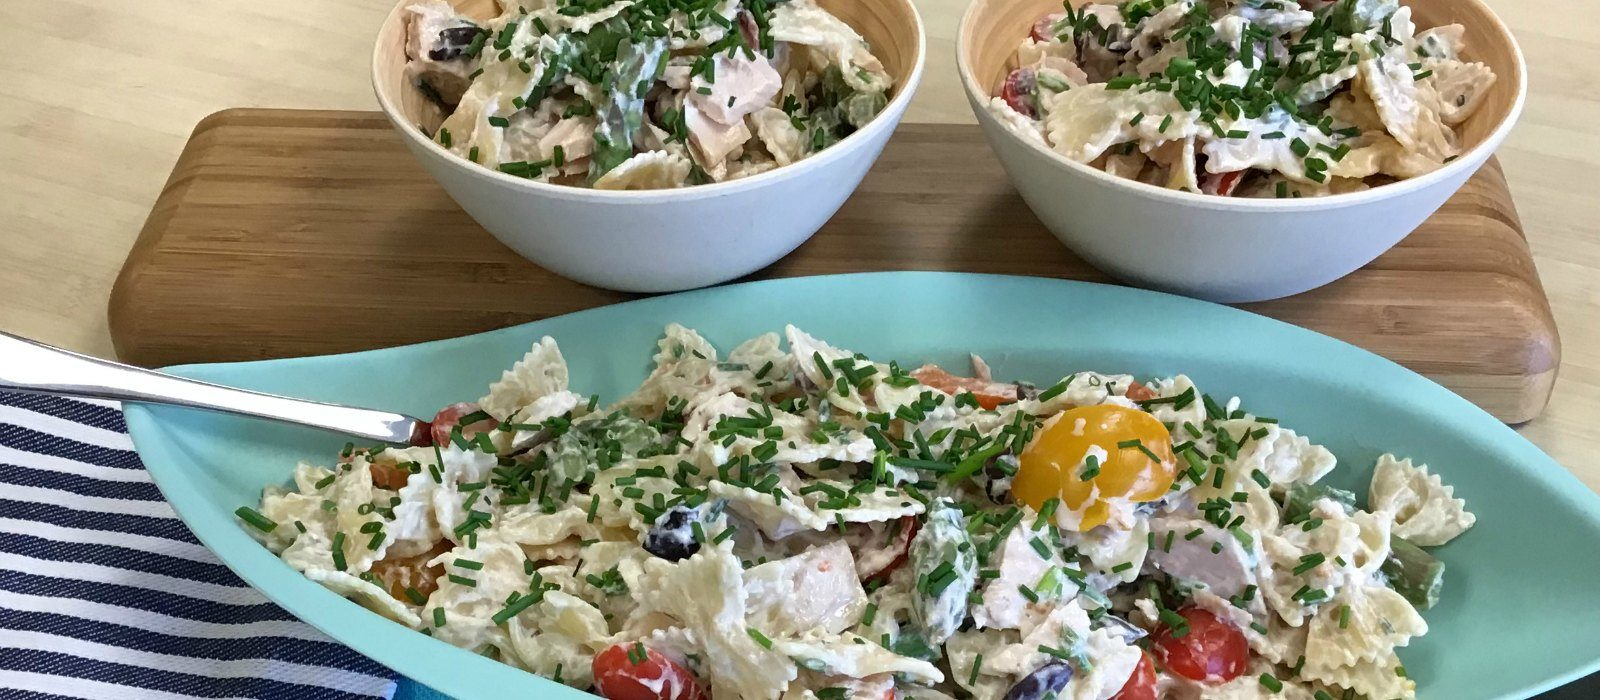 Spring Farfalle Nicoise Pasta Salad